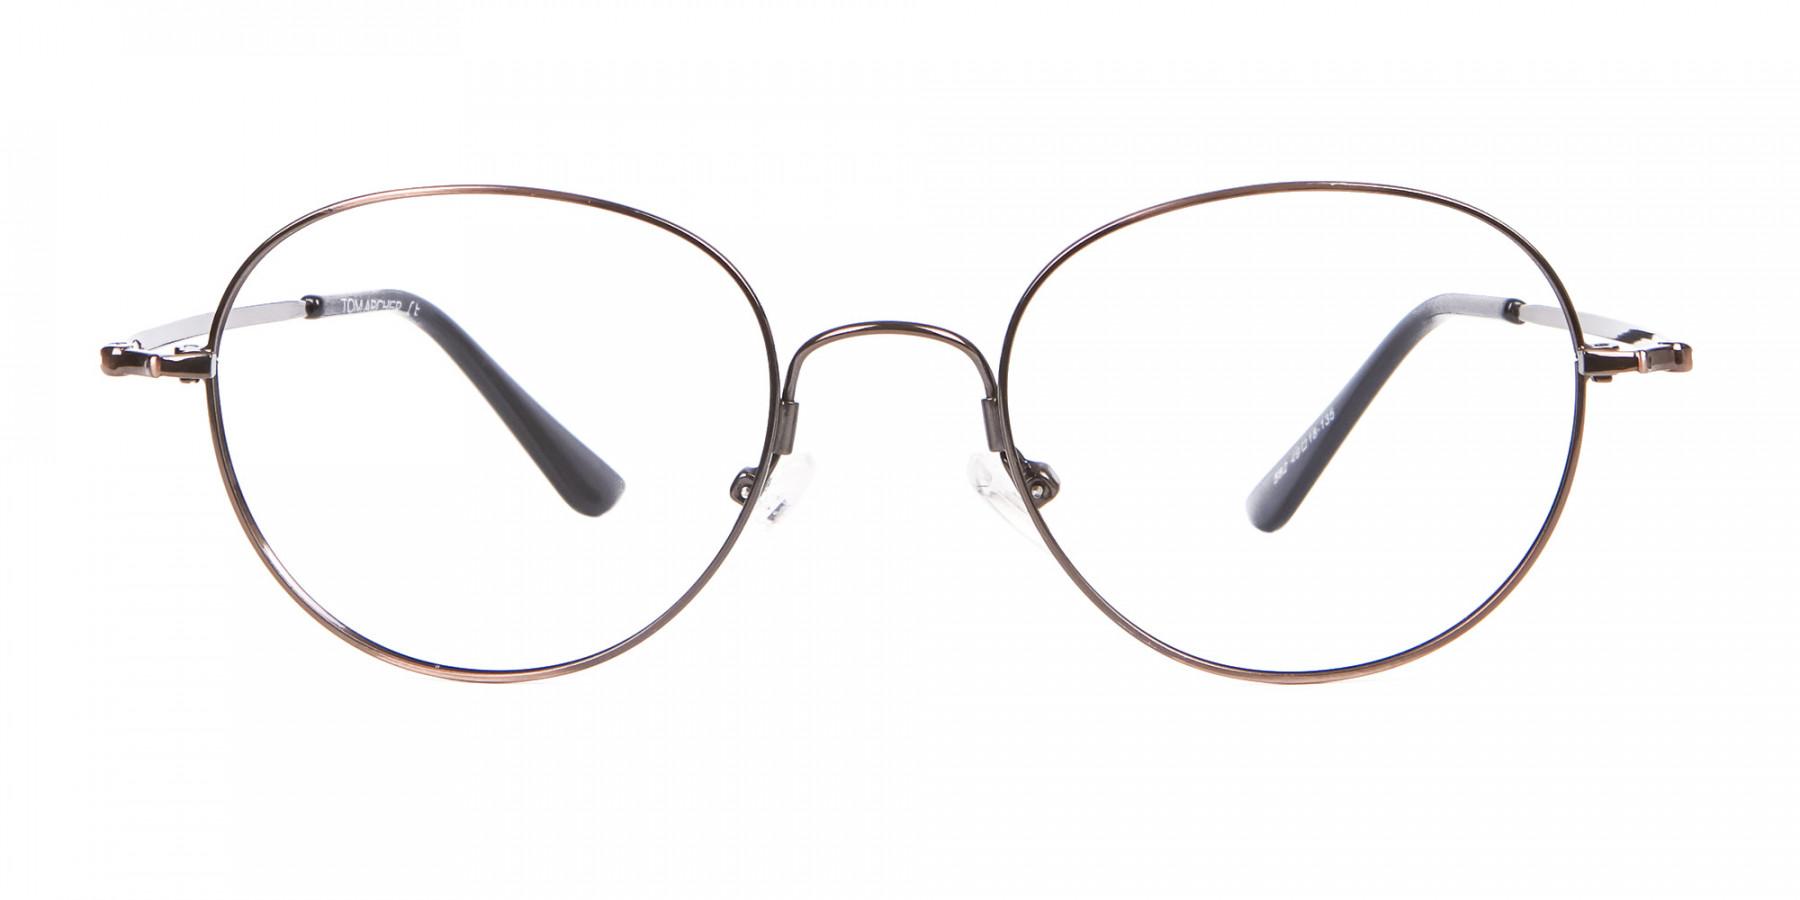 Thin Metal Retro Round Frame in Brown-1